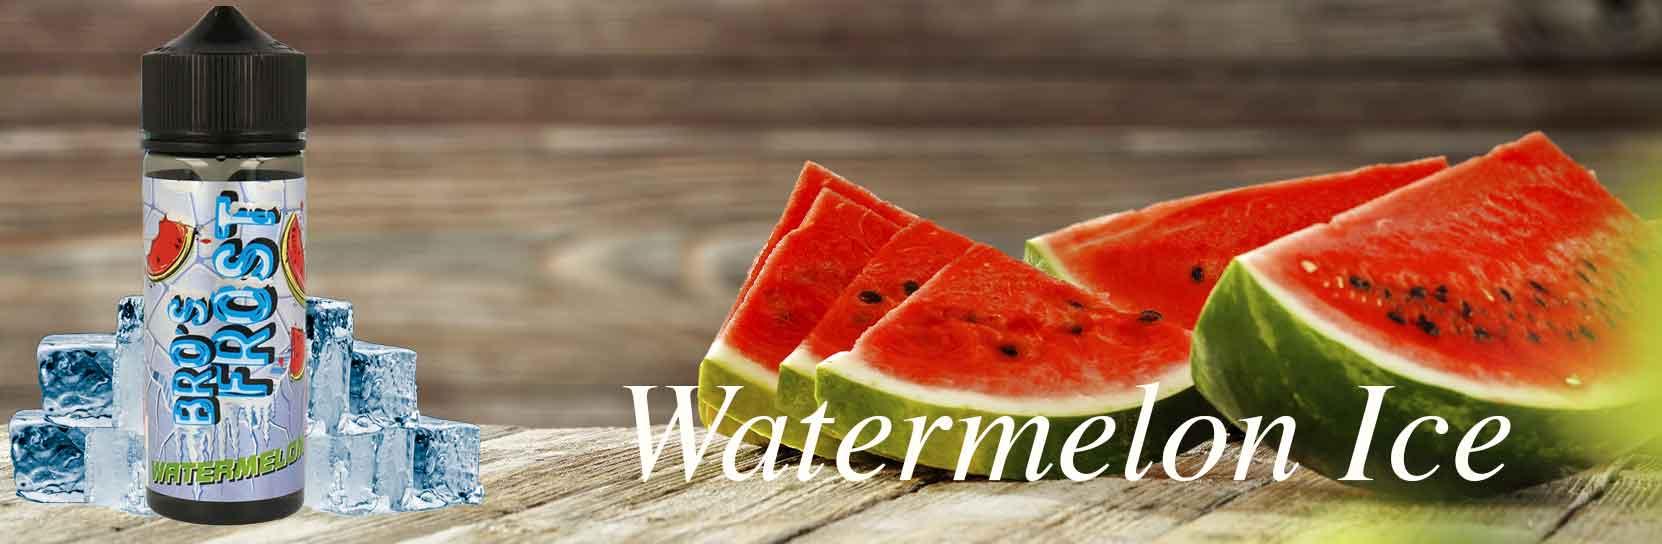 Bro-s-Frost-Watermelon-Banner